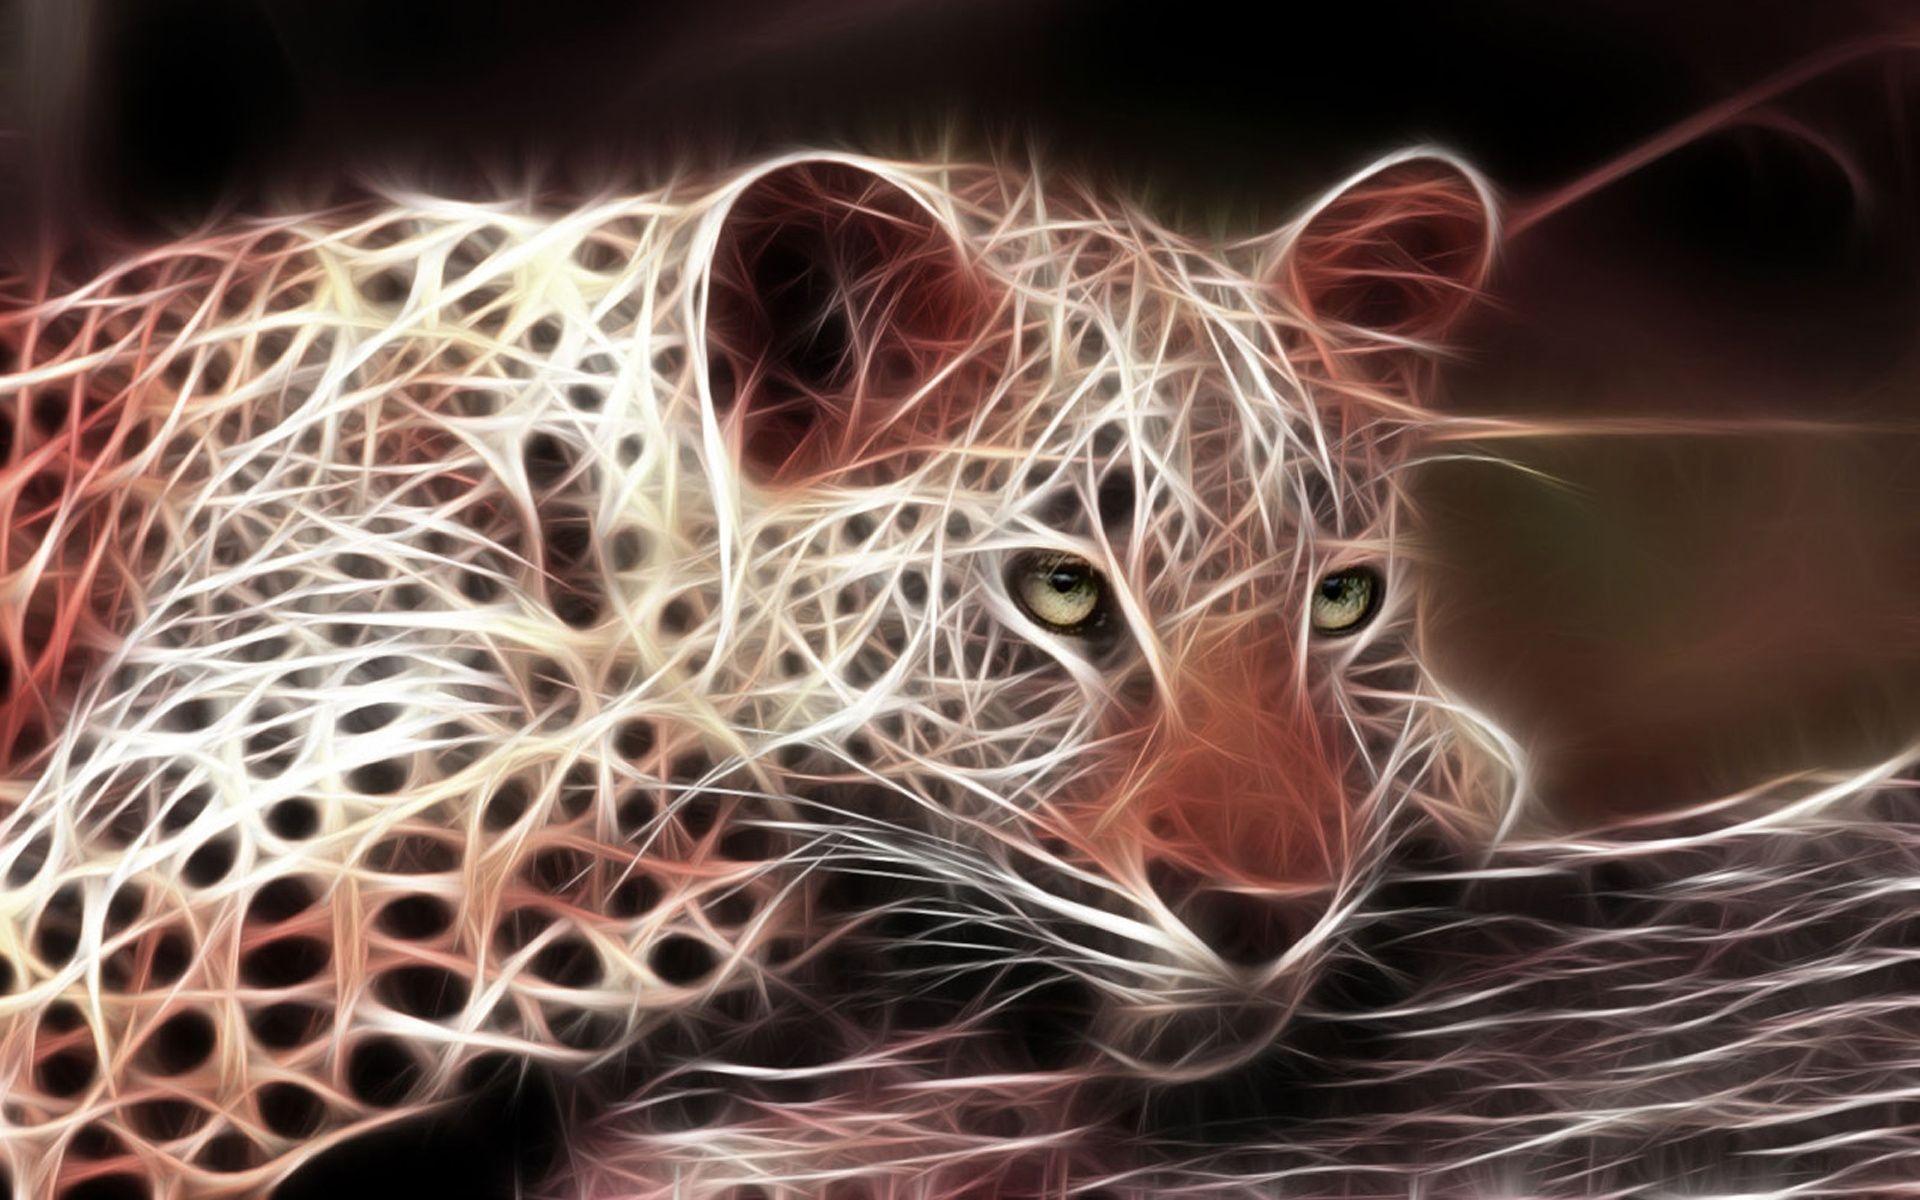 Wallpaper : 1920x1200 px, 3D, hewan, fraktal, macan tulul